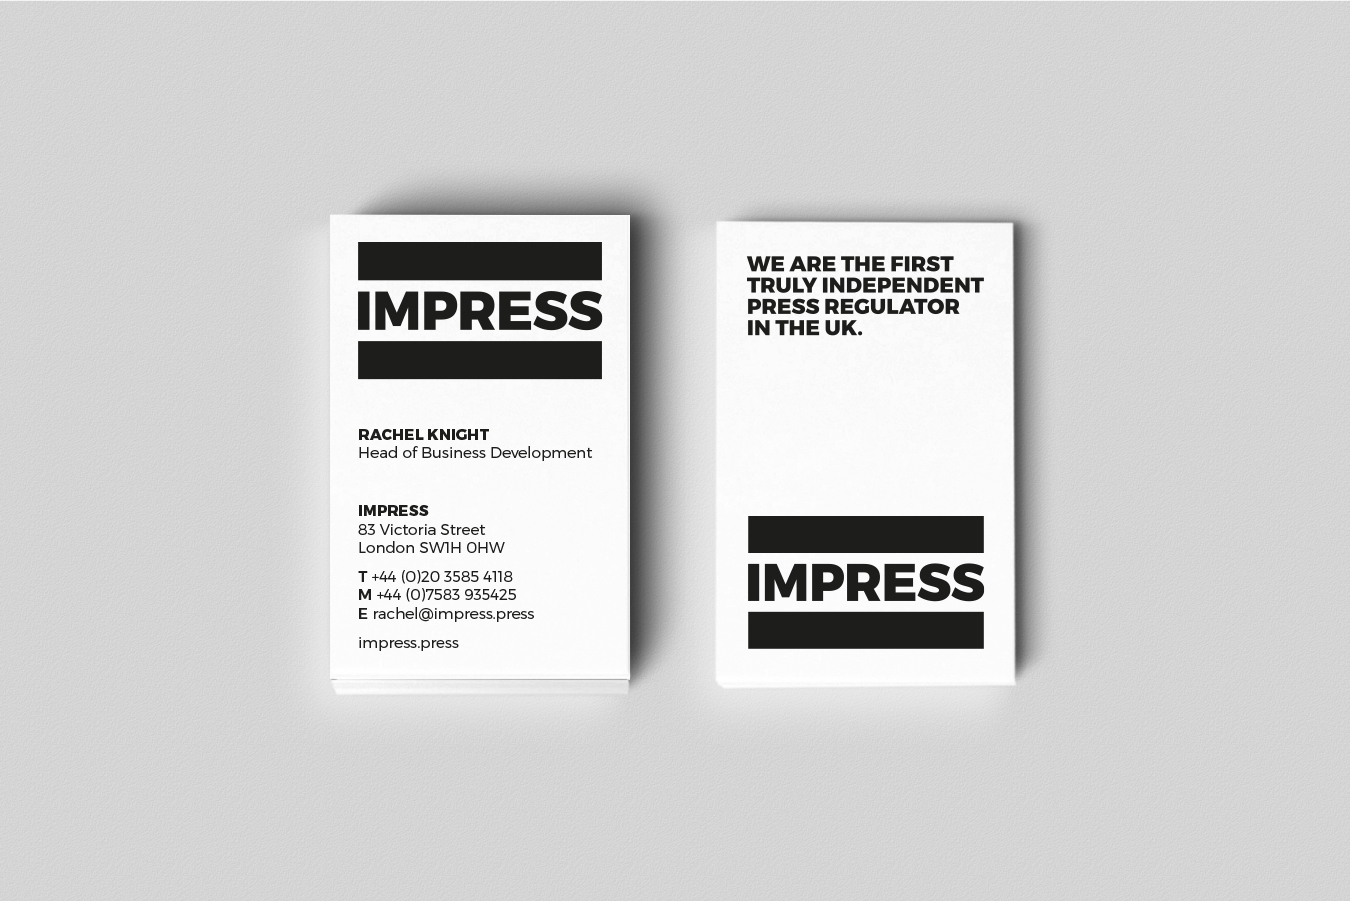 IMPRESS-03.jpg